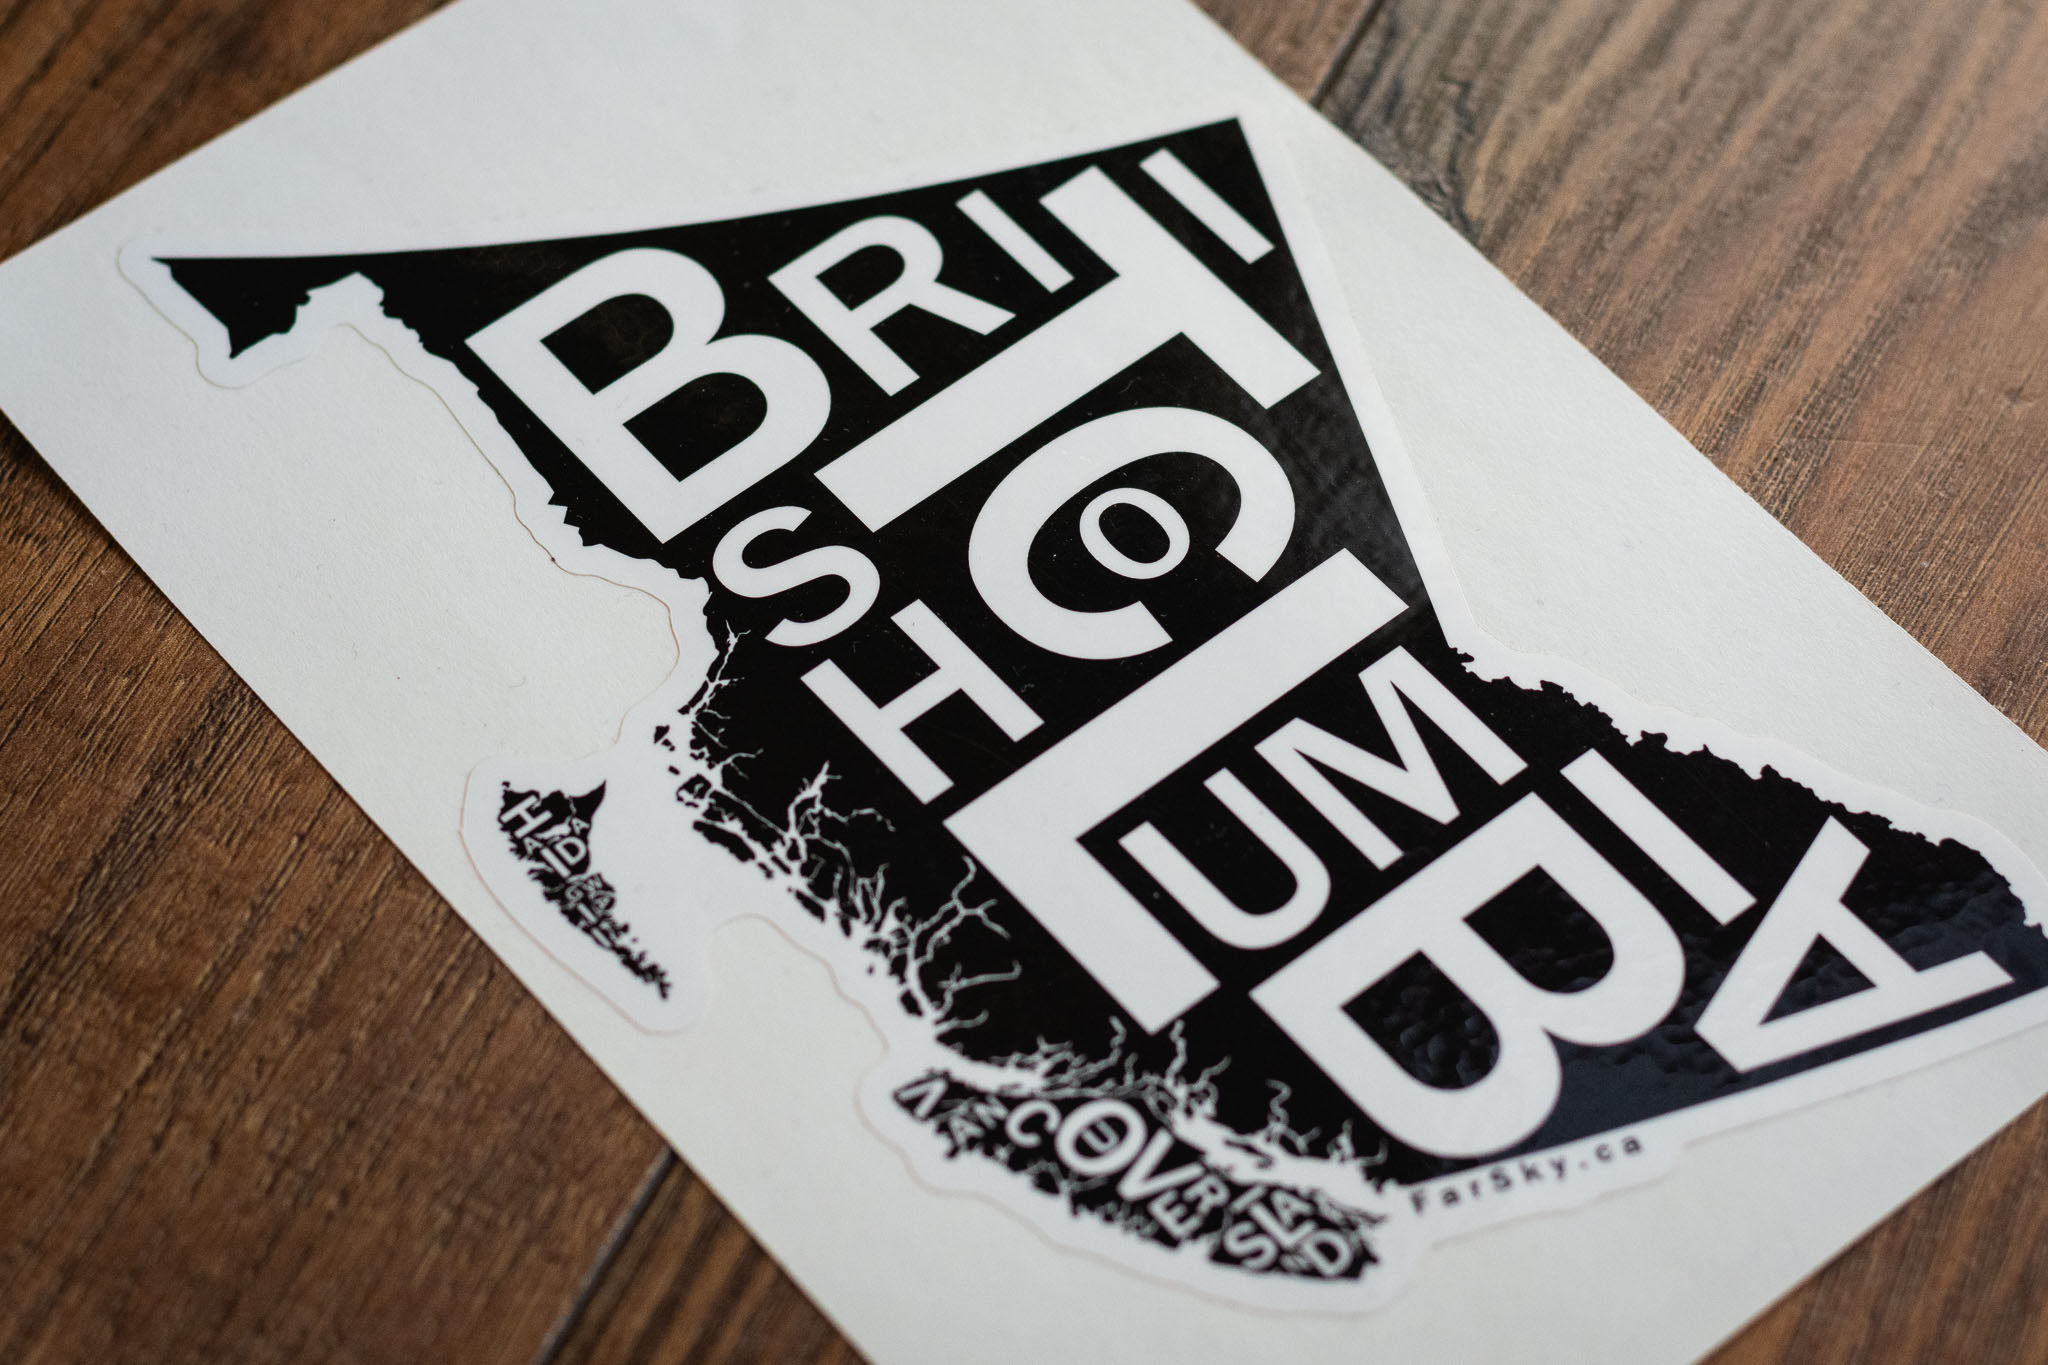 British Columbia Bumper Sticker